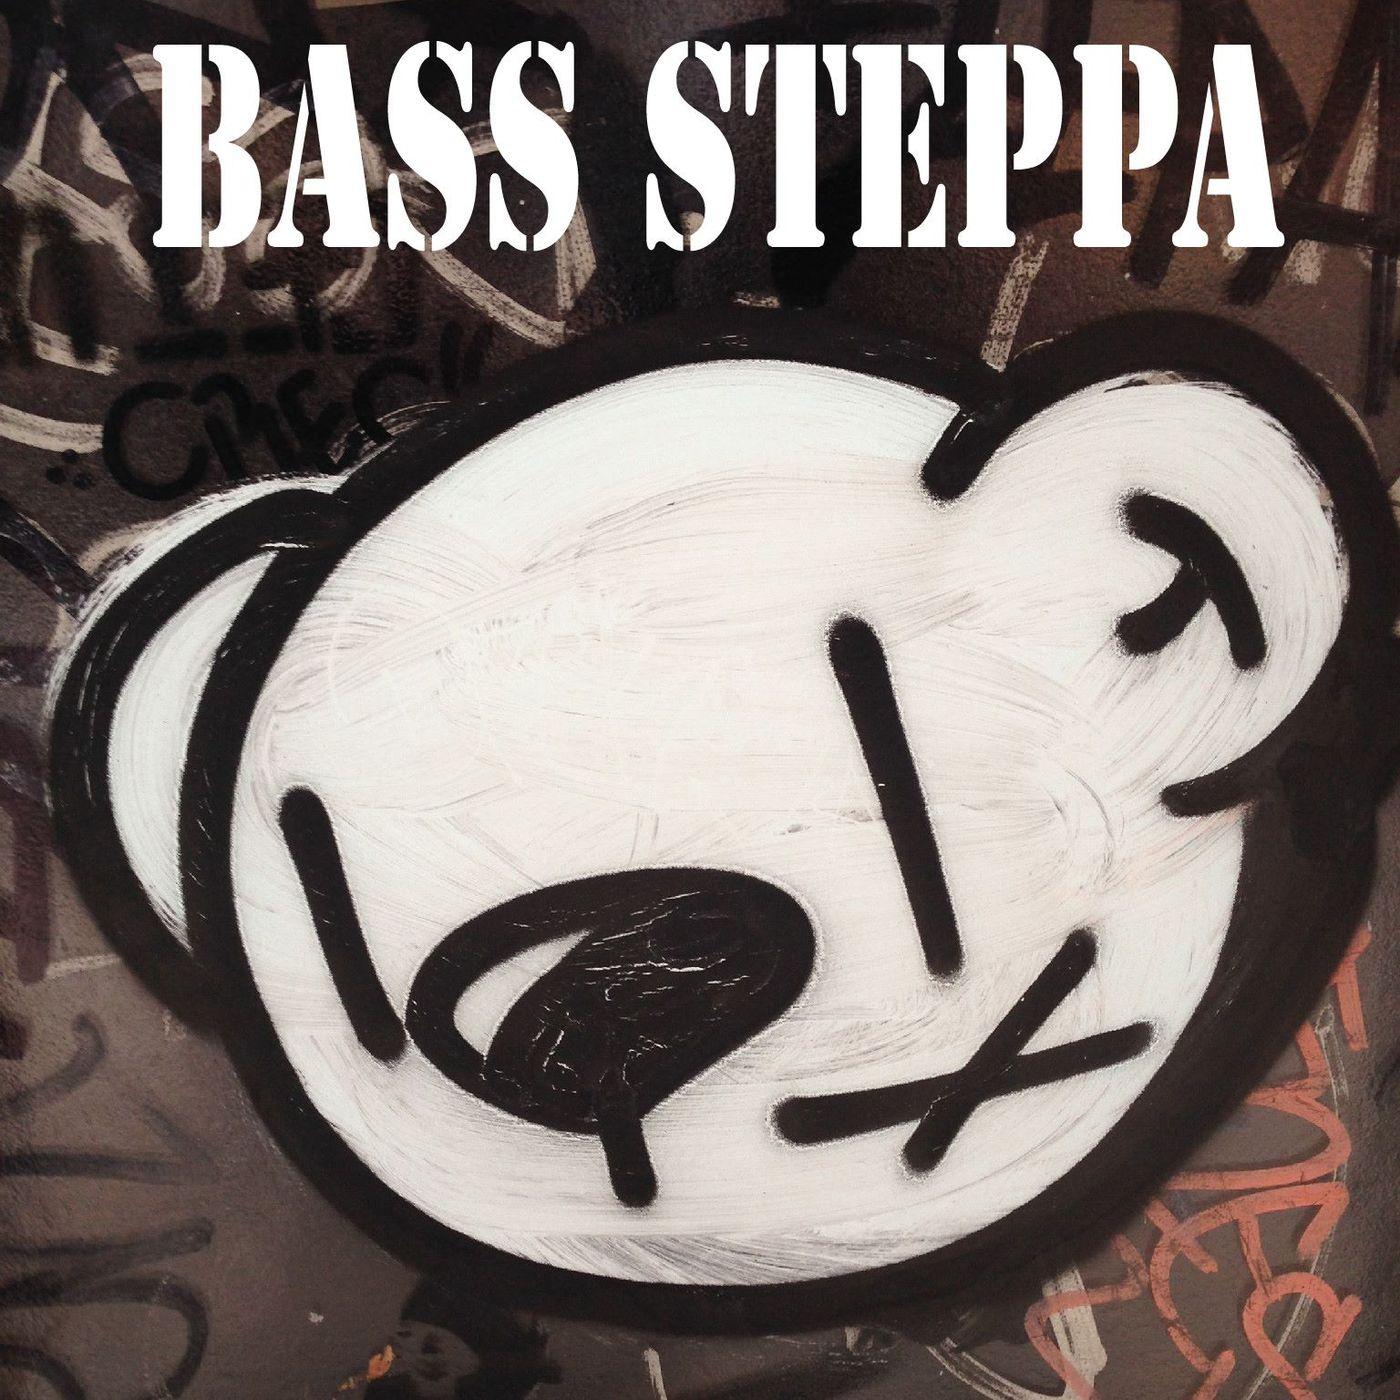 Bass Steppa Podcast